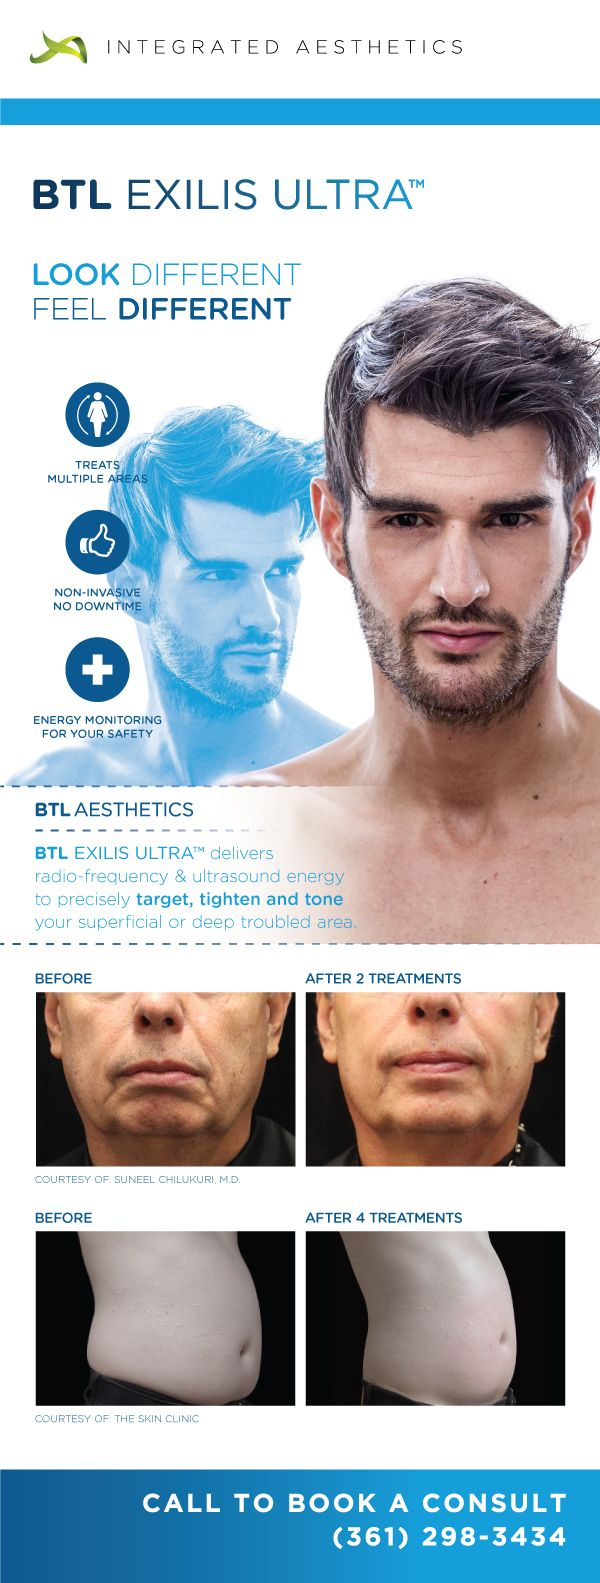 Houston Exilis Ultra 360 Skin Tightening Skin Reduce Wrinkles